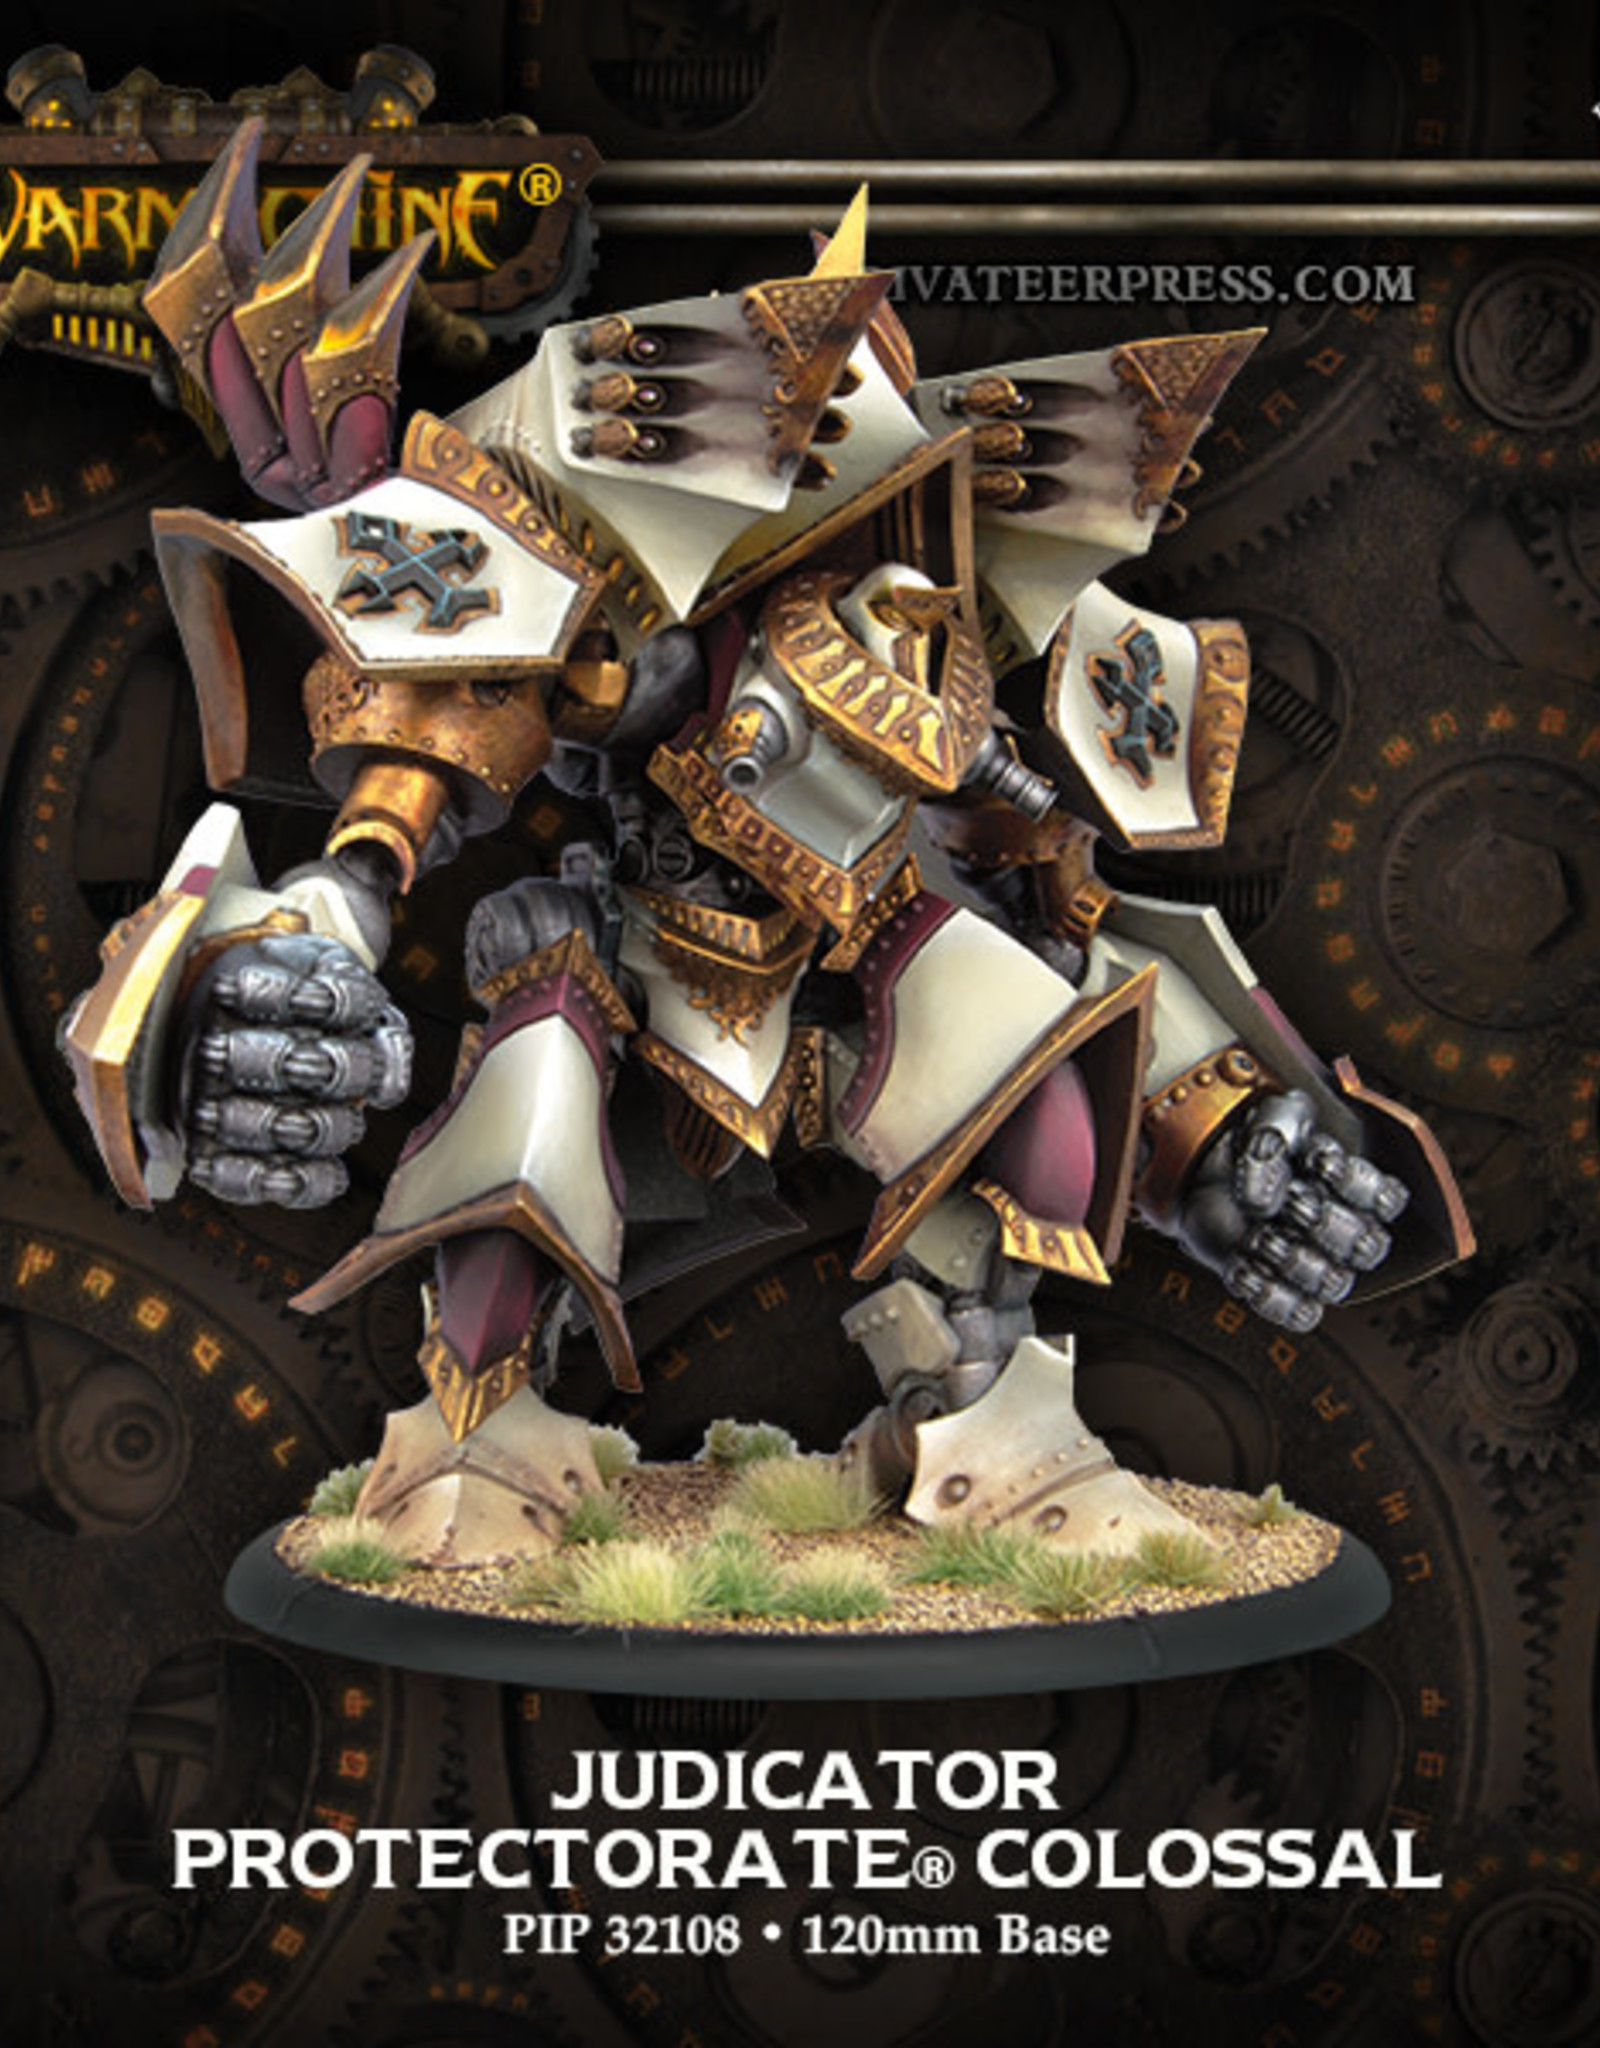 Warmachine Protectorate - Judicator/Revalator